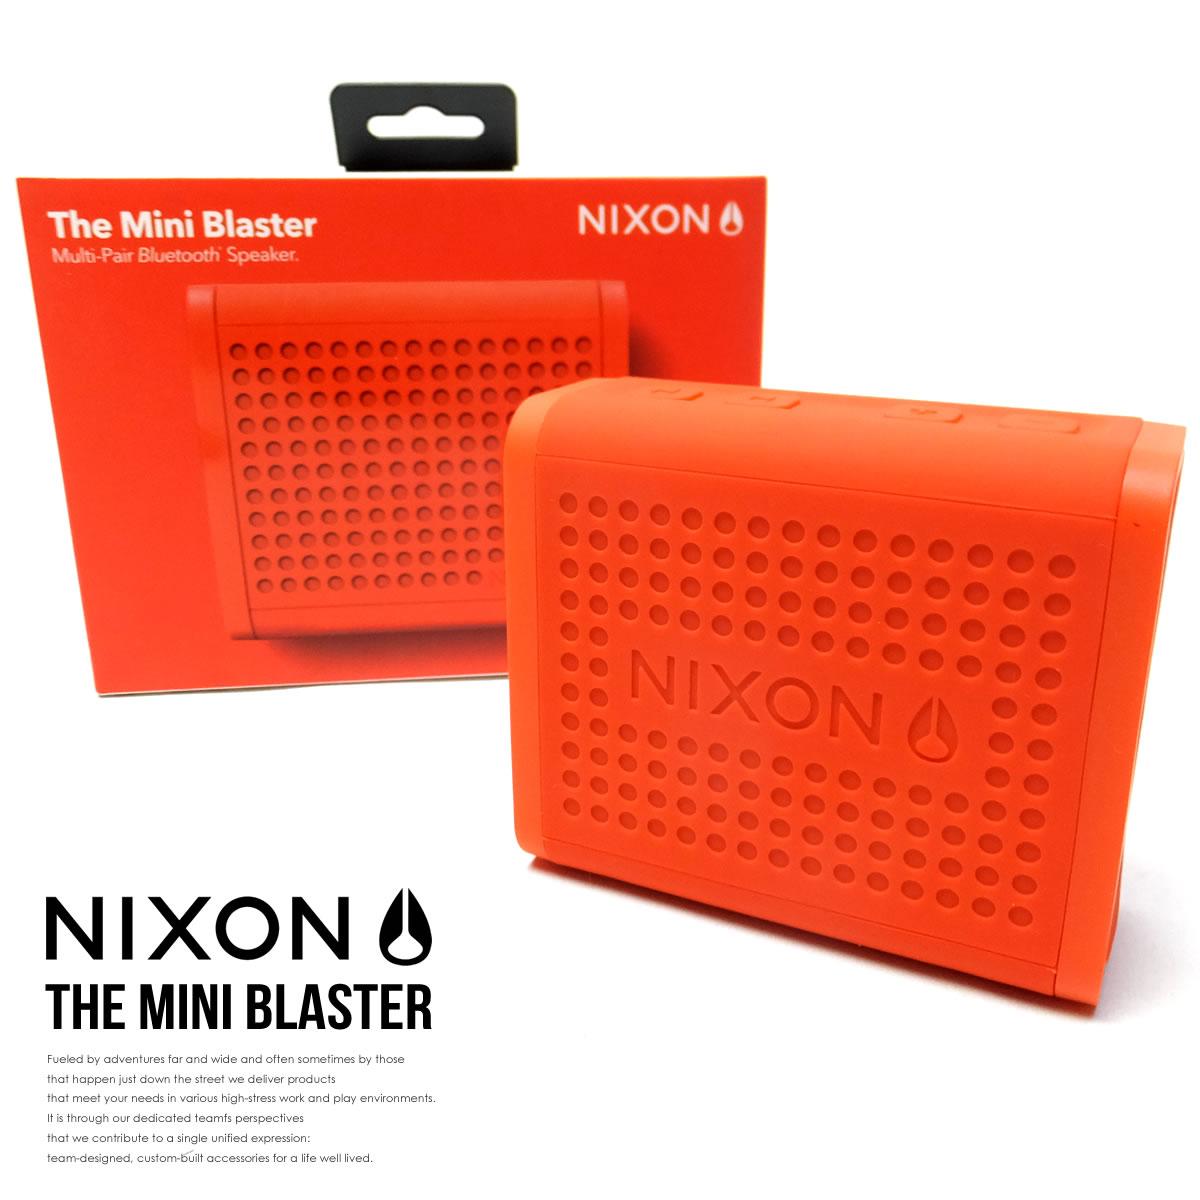 NIXON スピーカー THE MINI BLASTER RED-PEPPER NH012383 6V9124